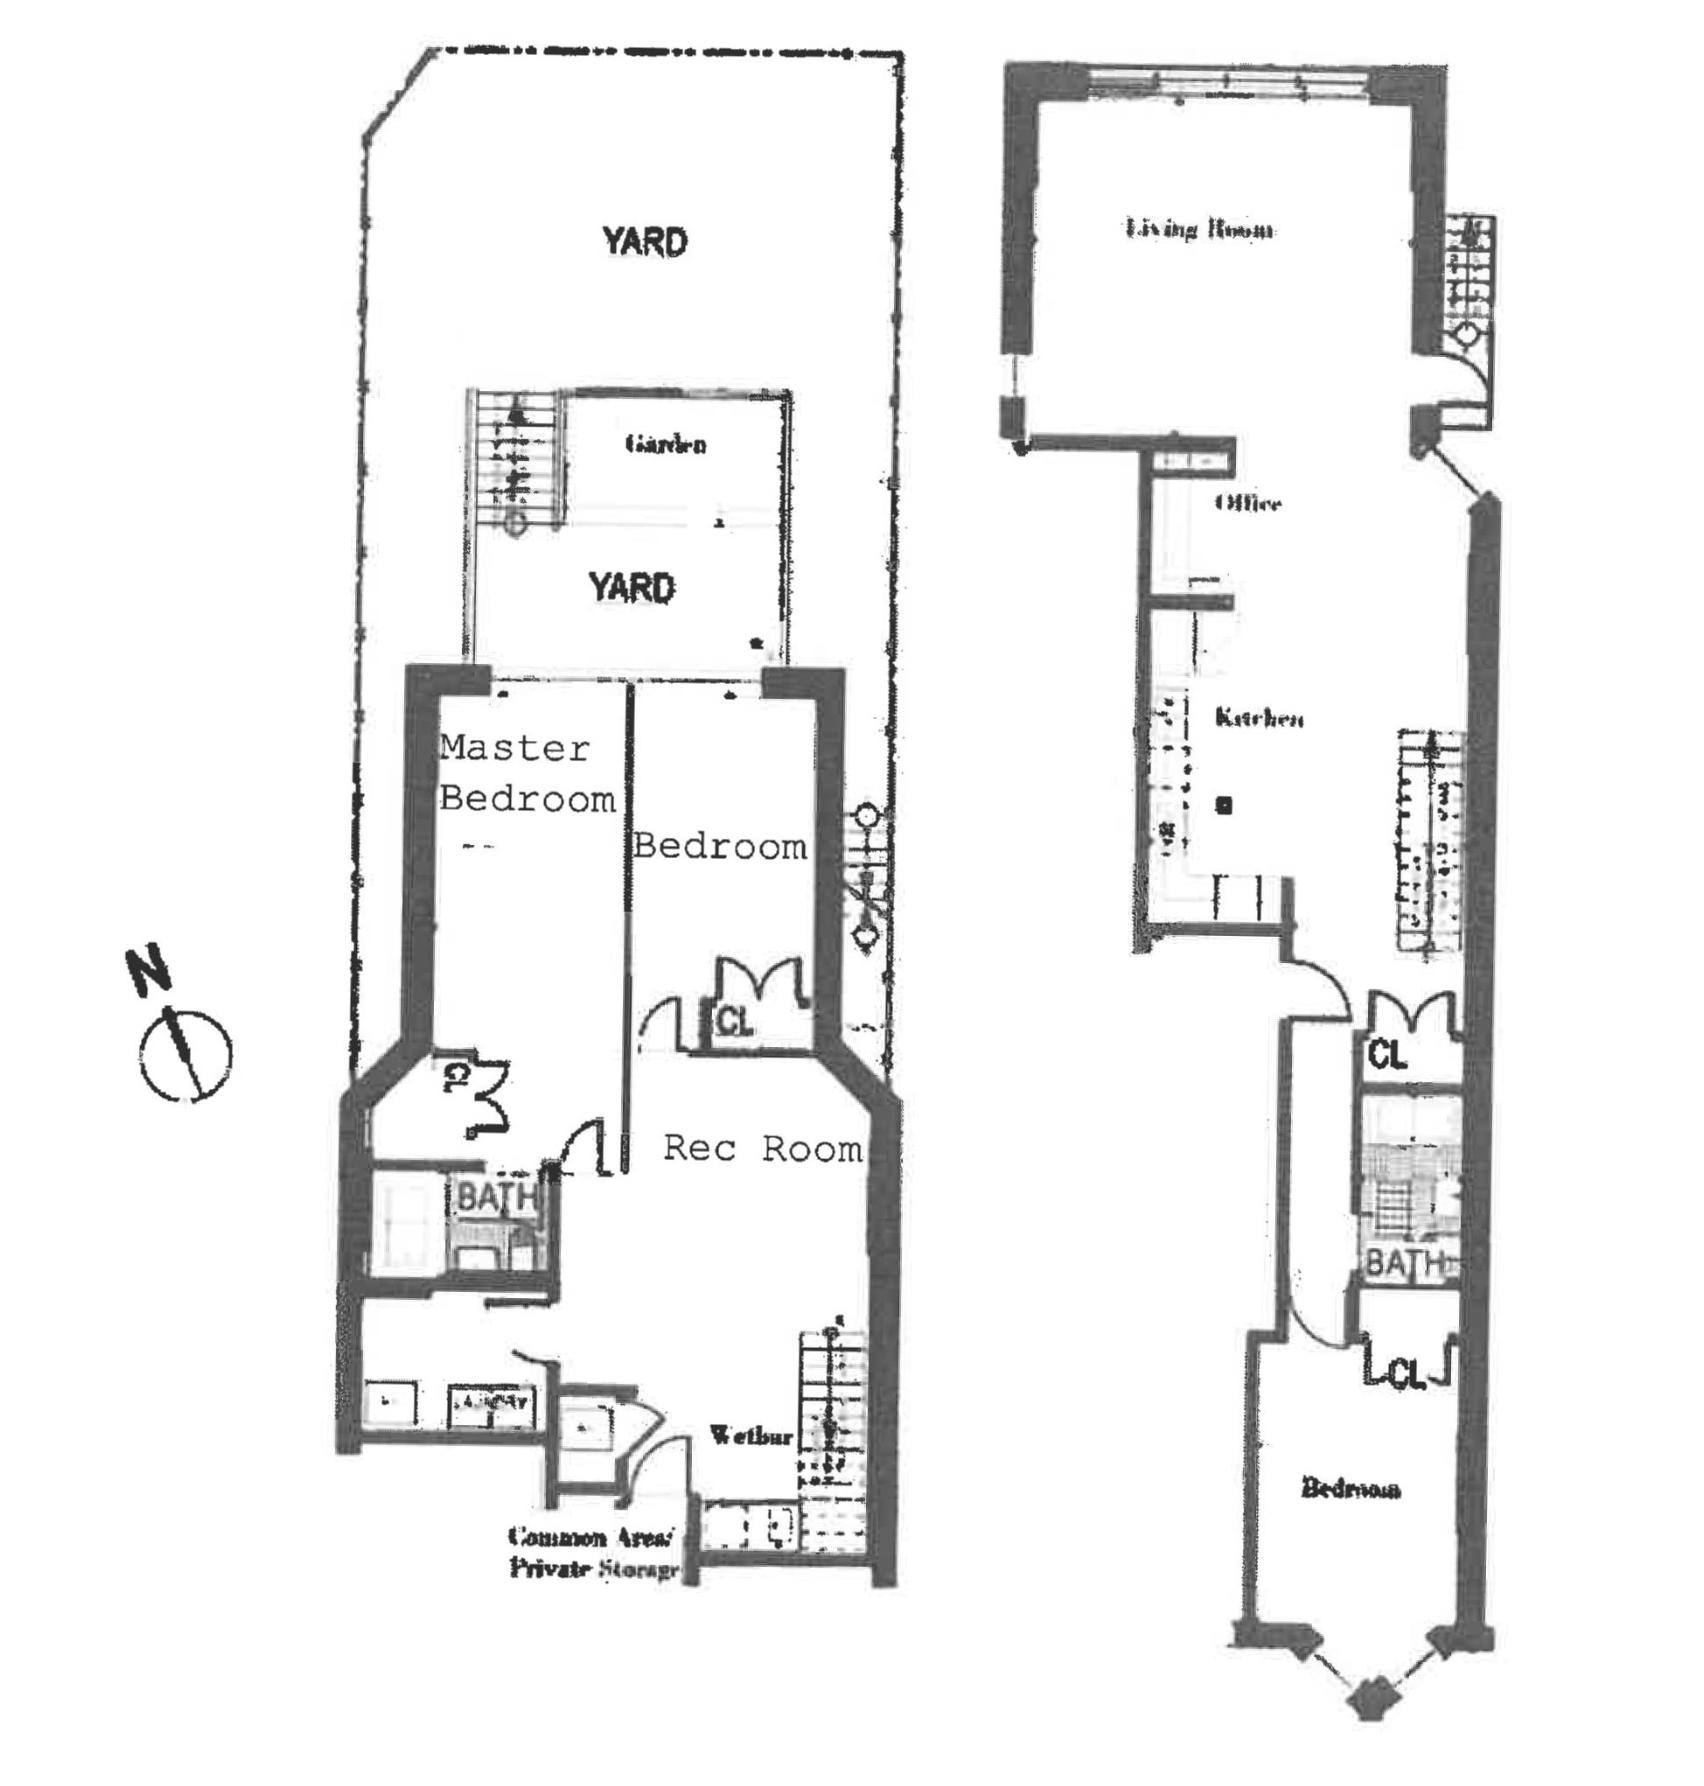 499 Dean Street Floor plan Apt 1A.png